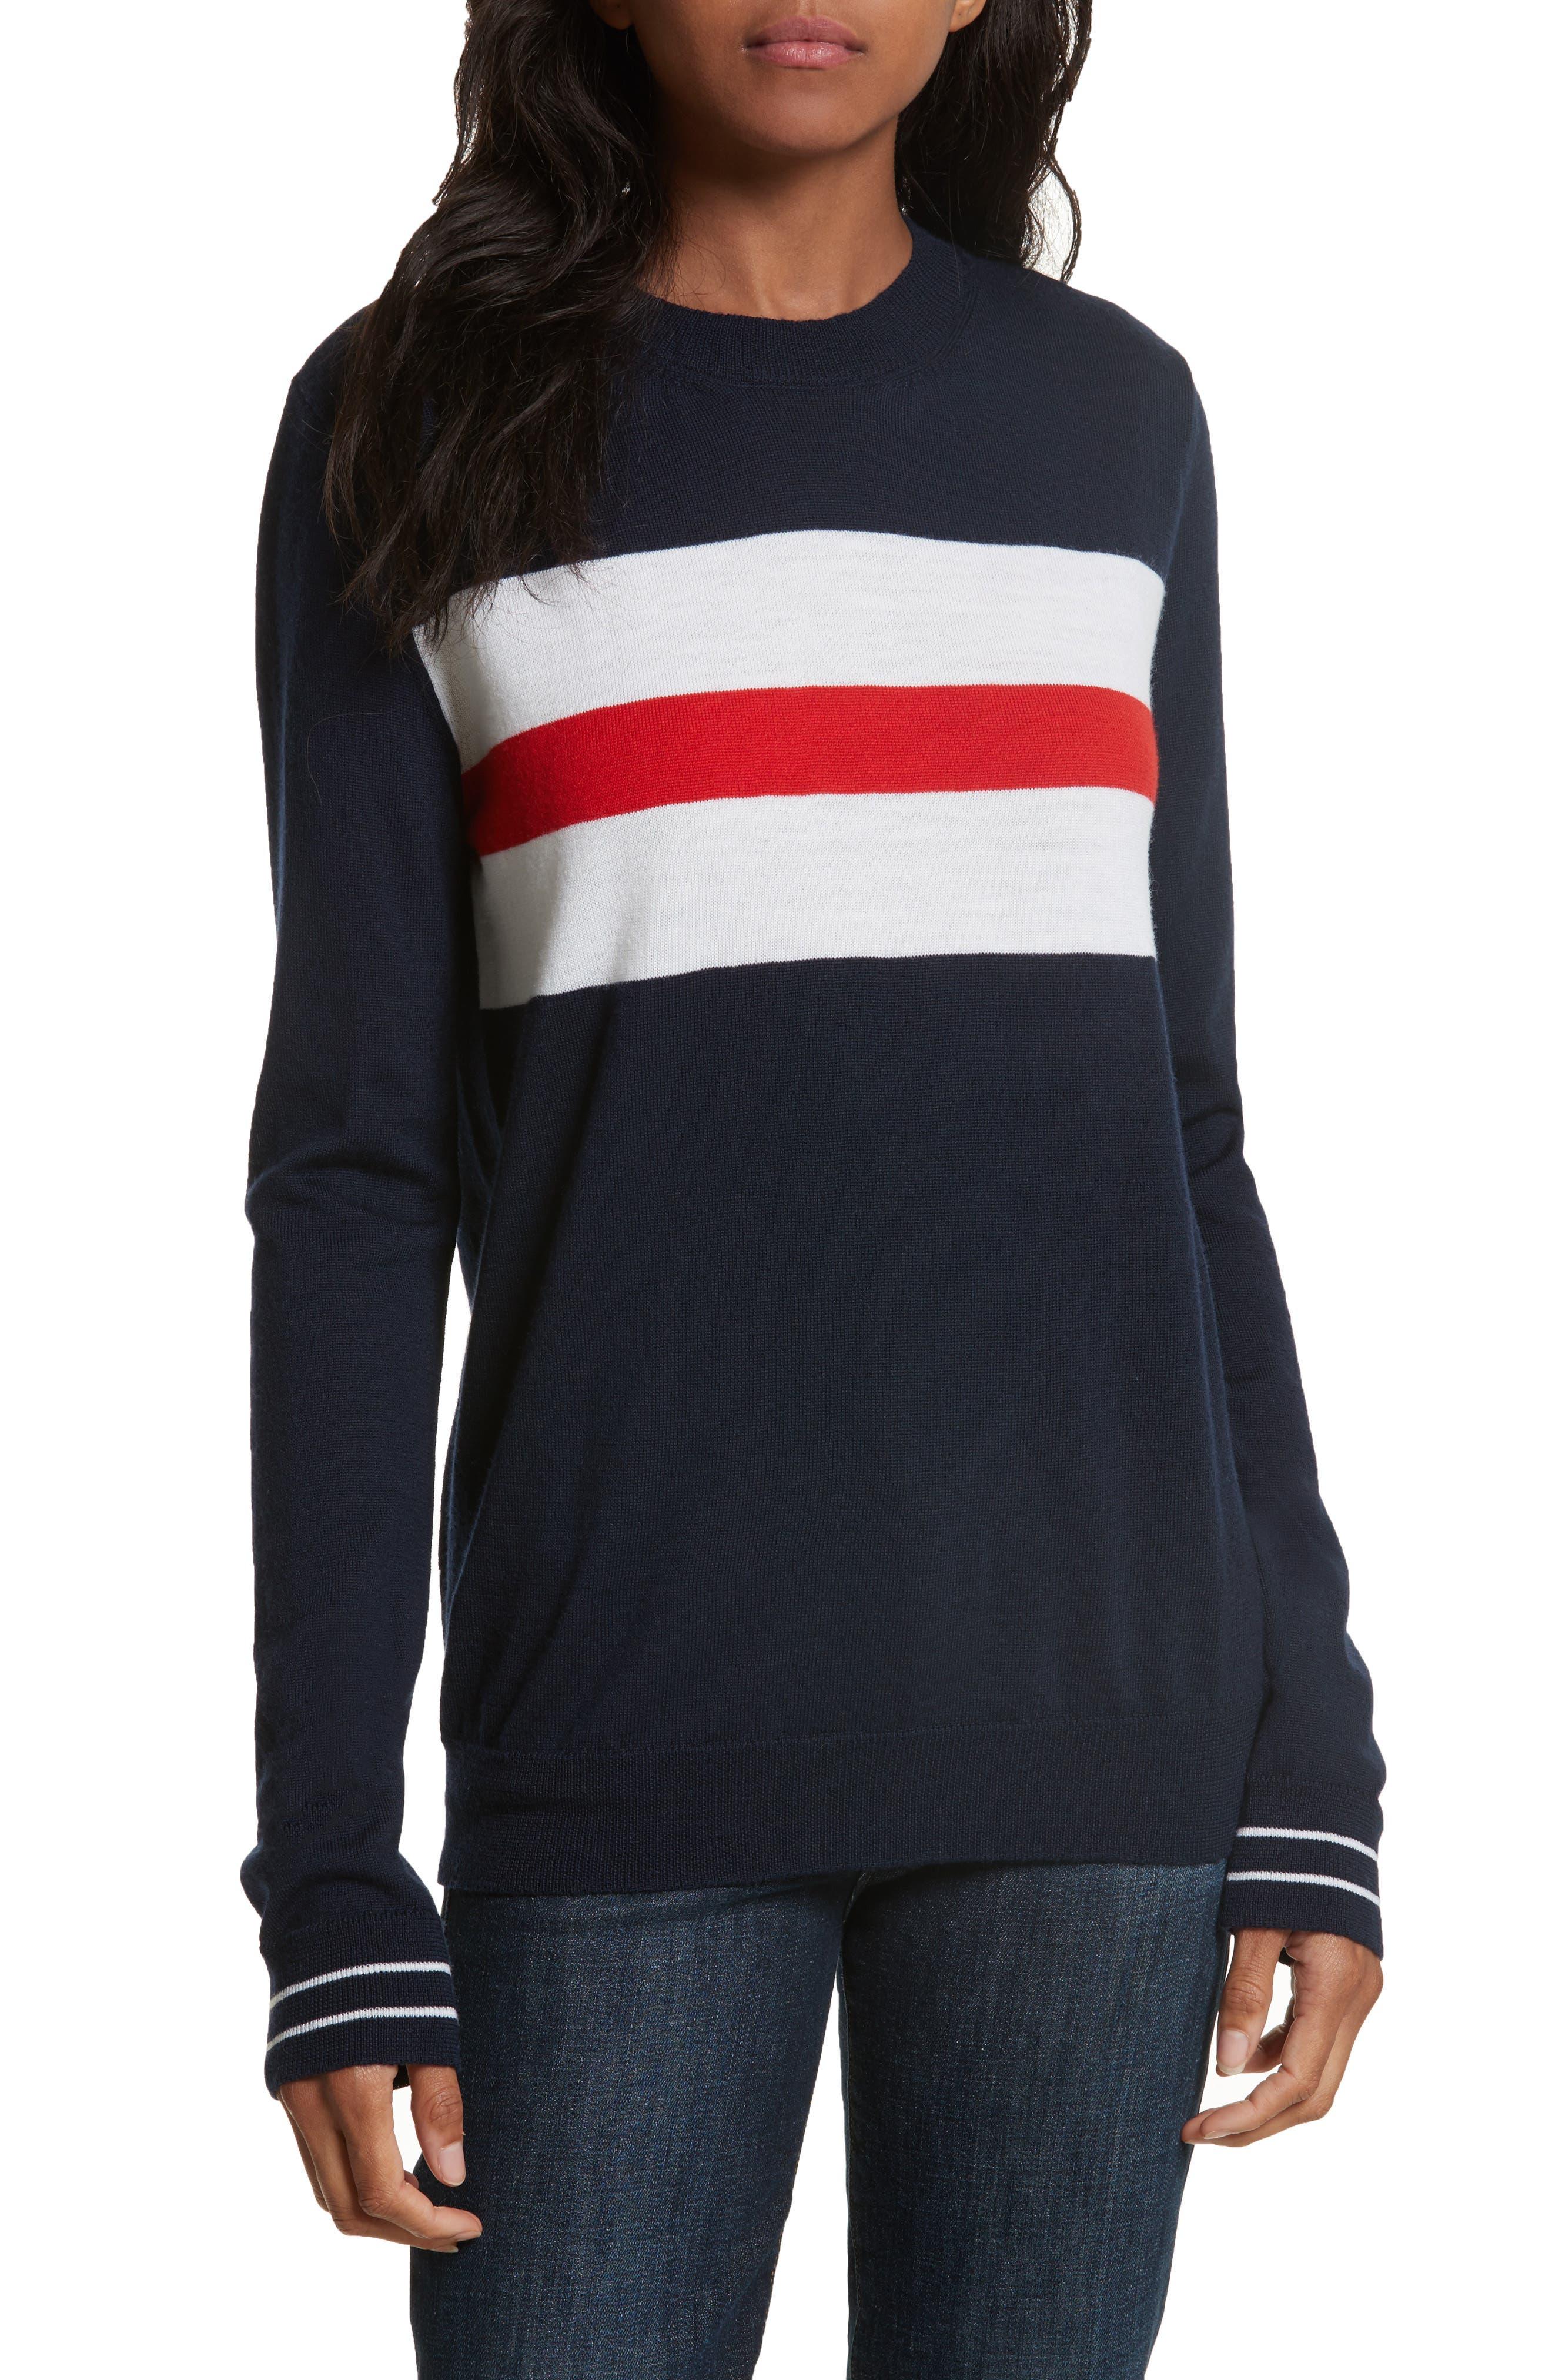 Main Image - être cécile Boyfriend Knit Merino Wool Sweater